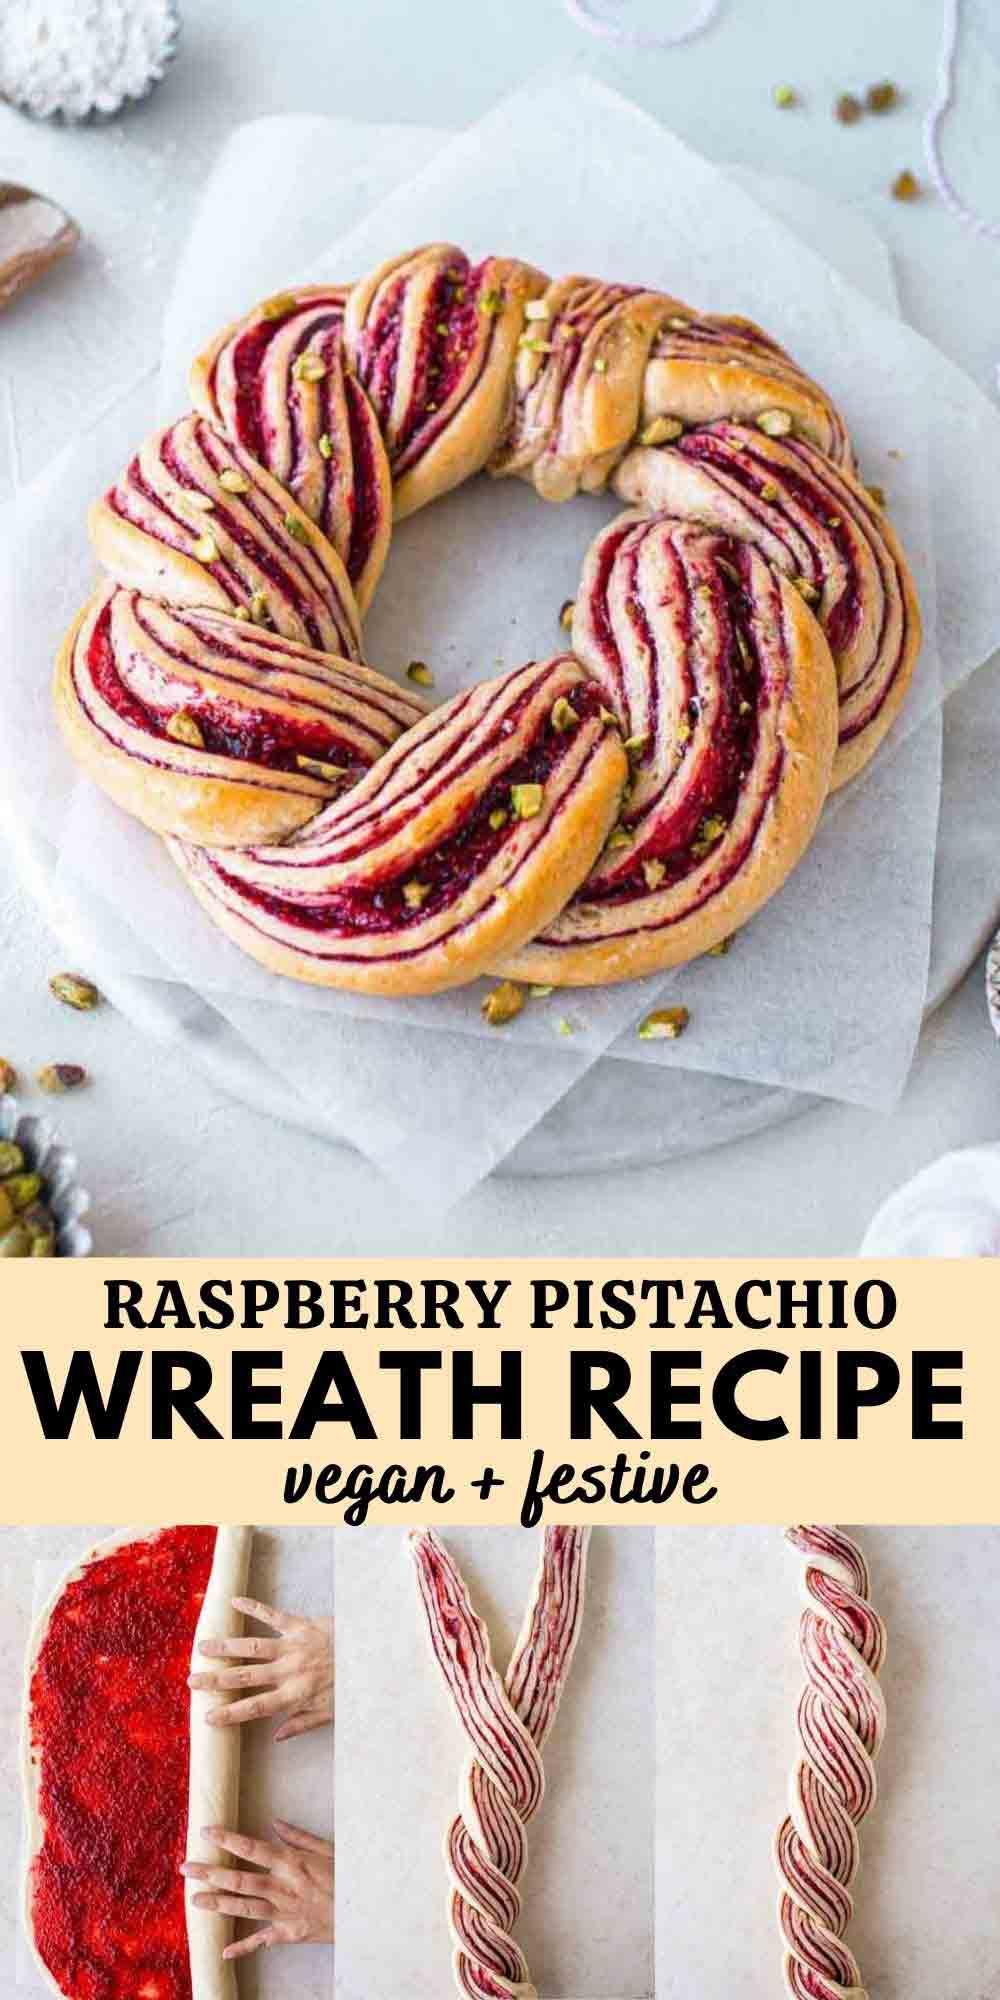 Raspberry and Pistachio Wreath Recipe